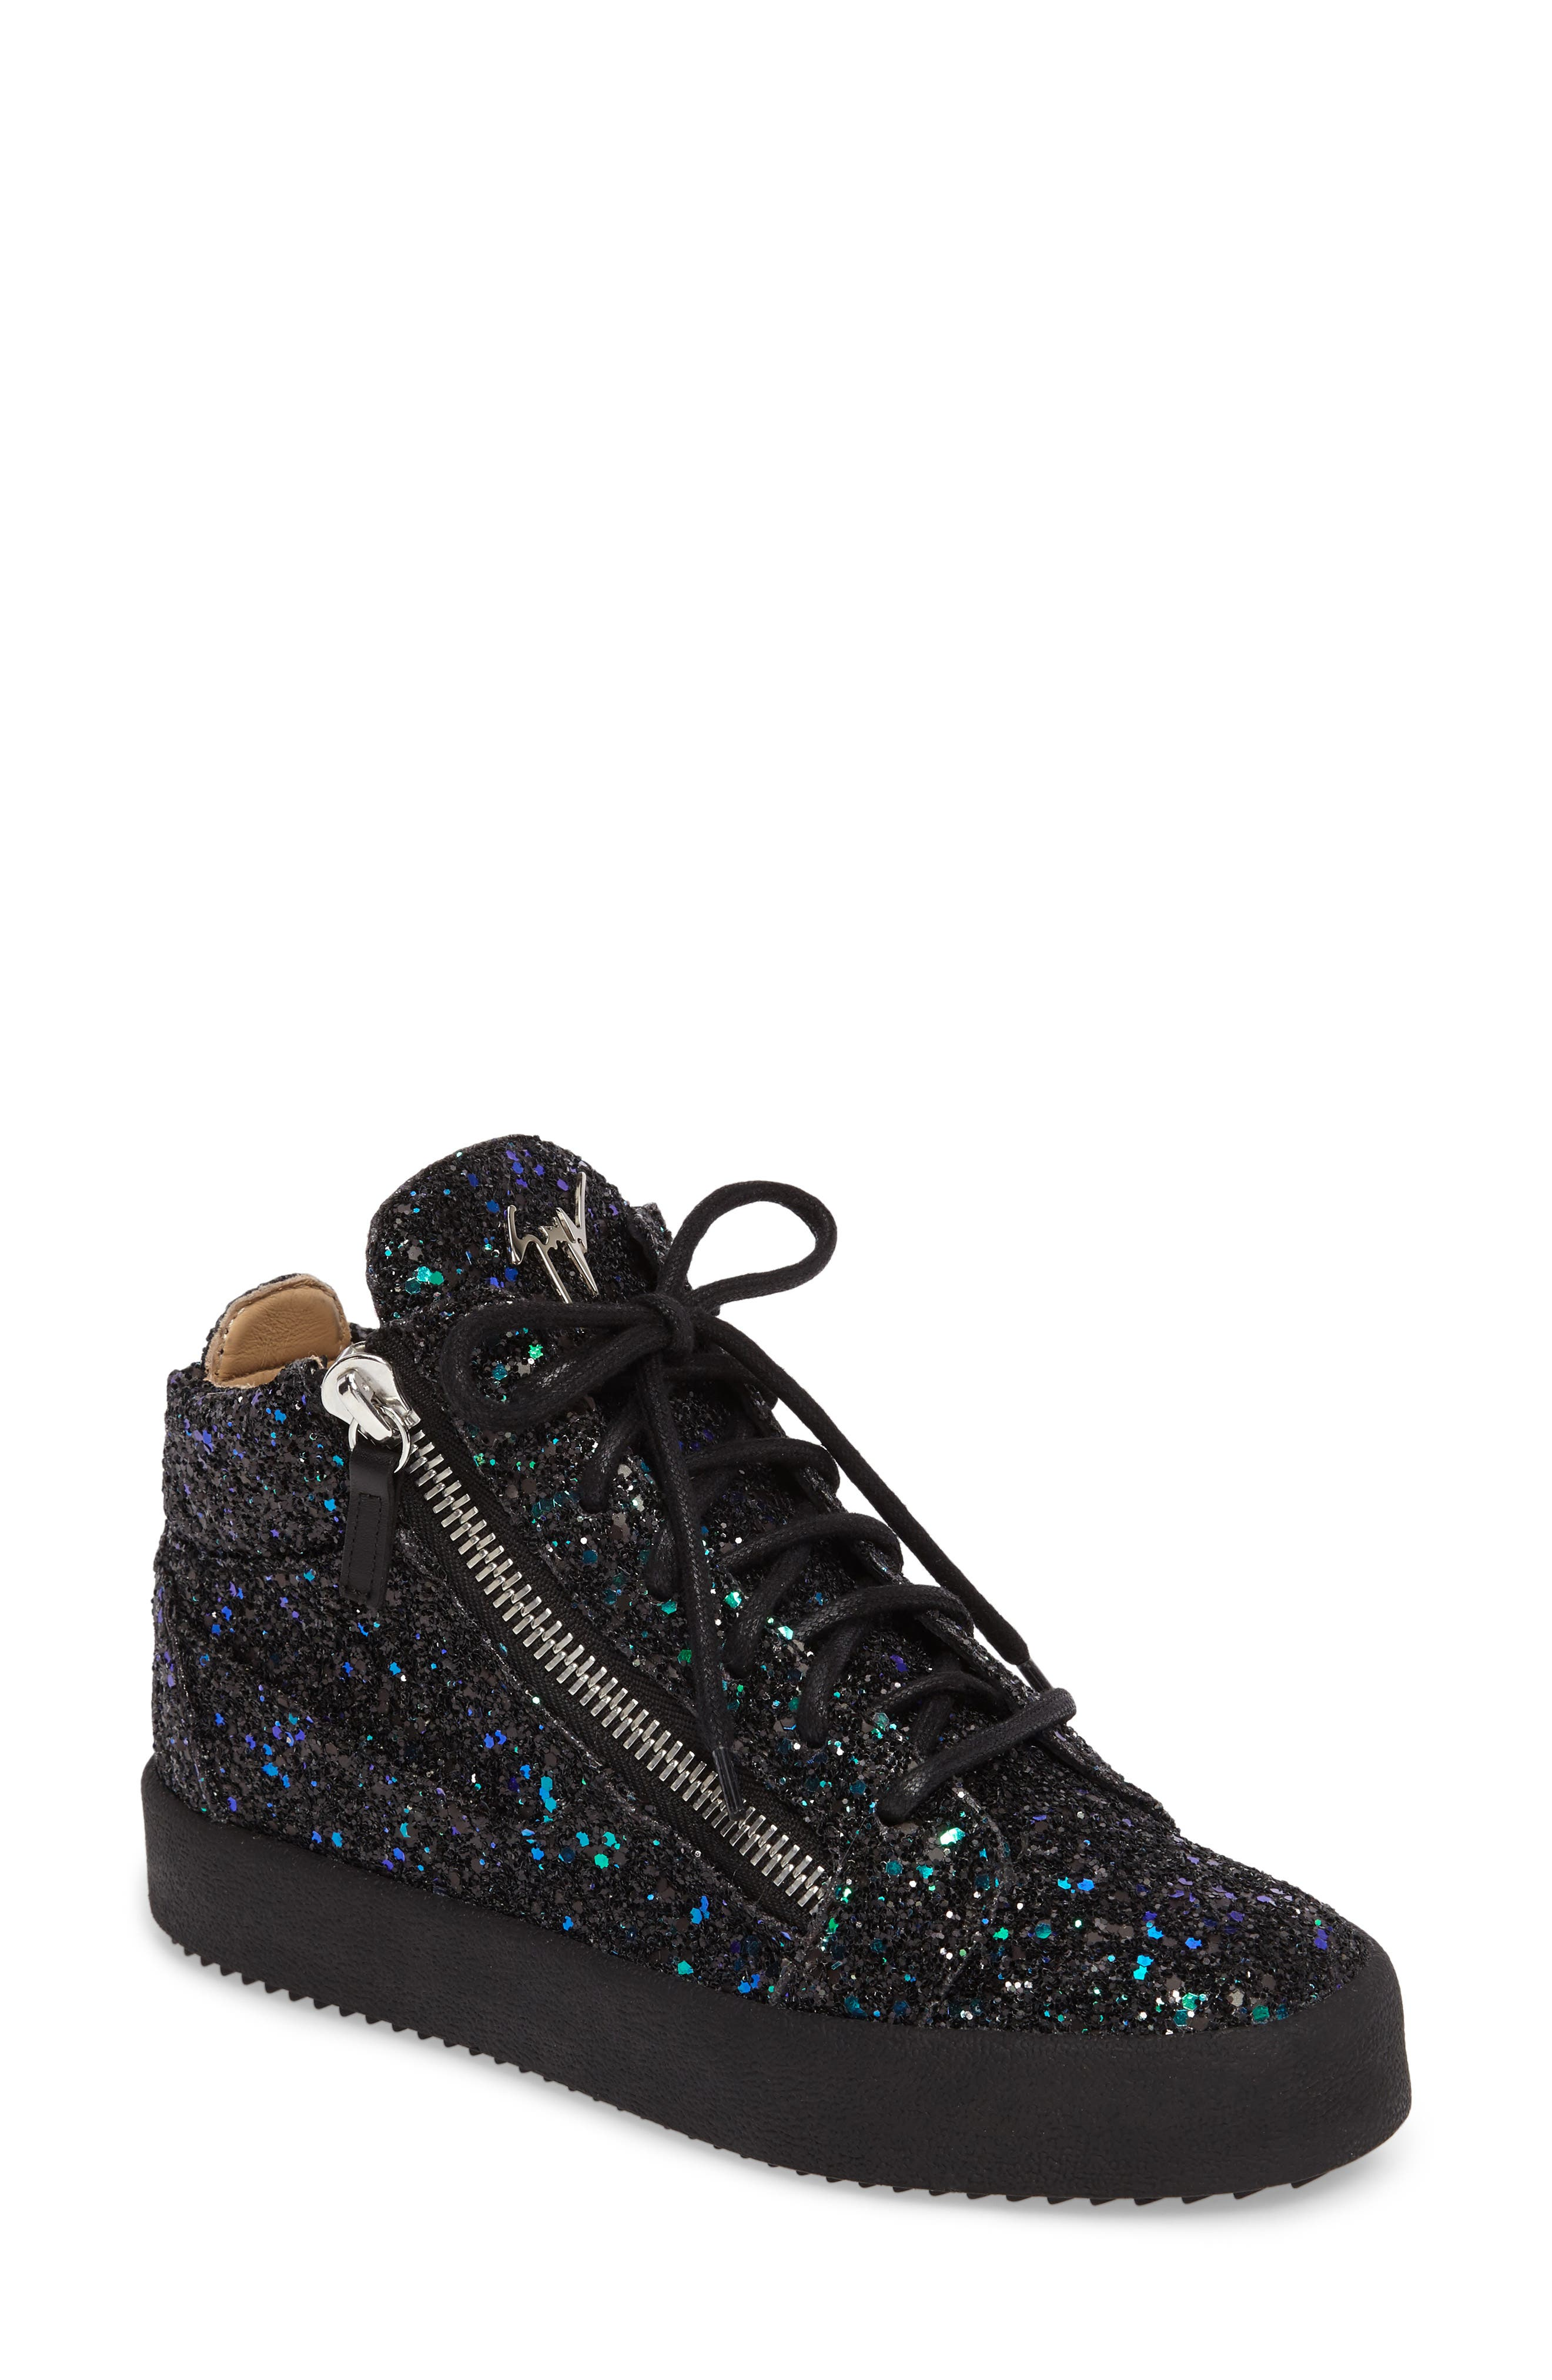 GIUSEPPE ZANOTTI 'Breck' Mid Top Sneaker